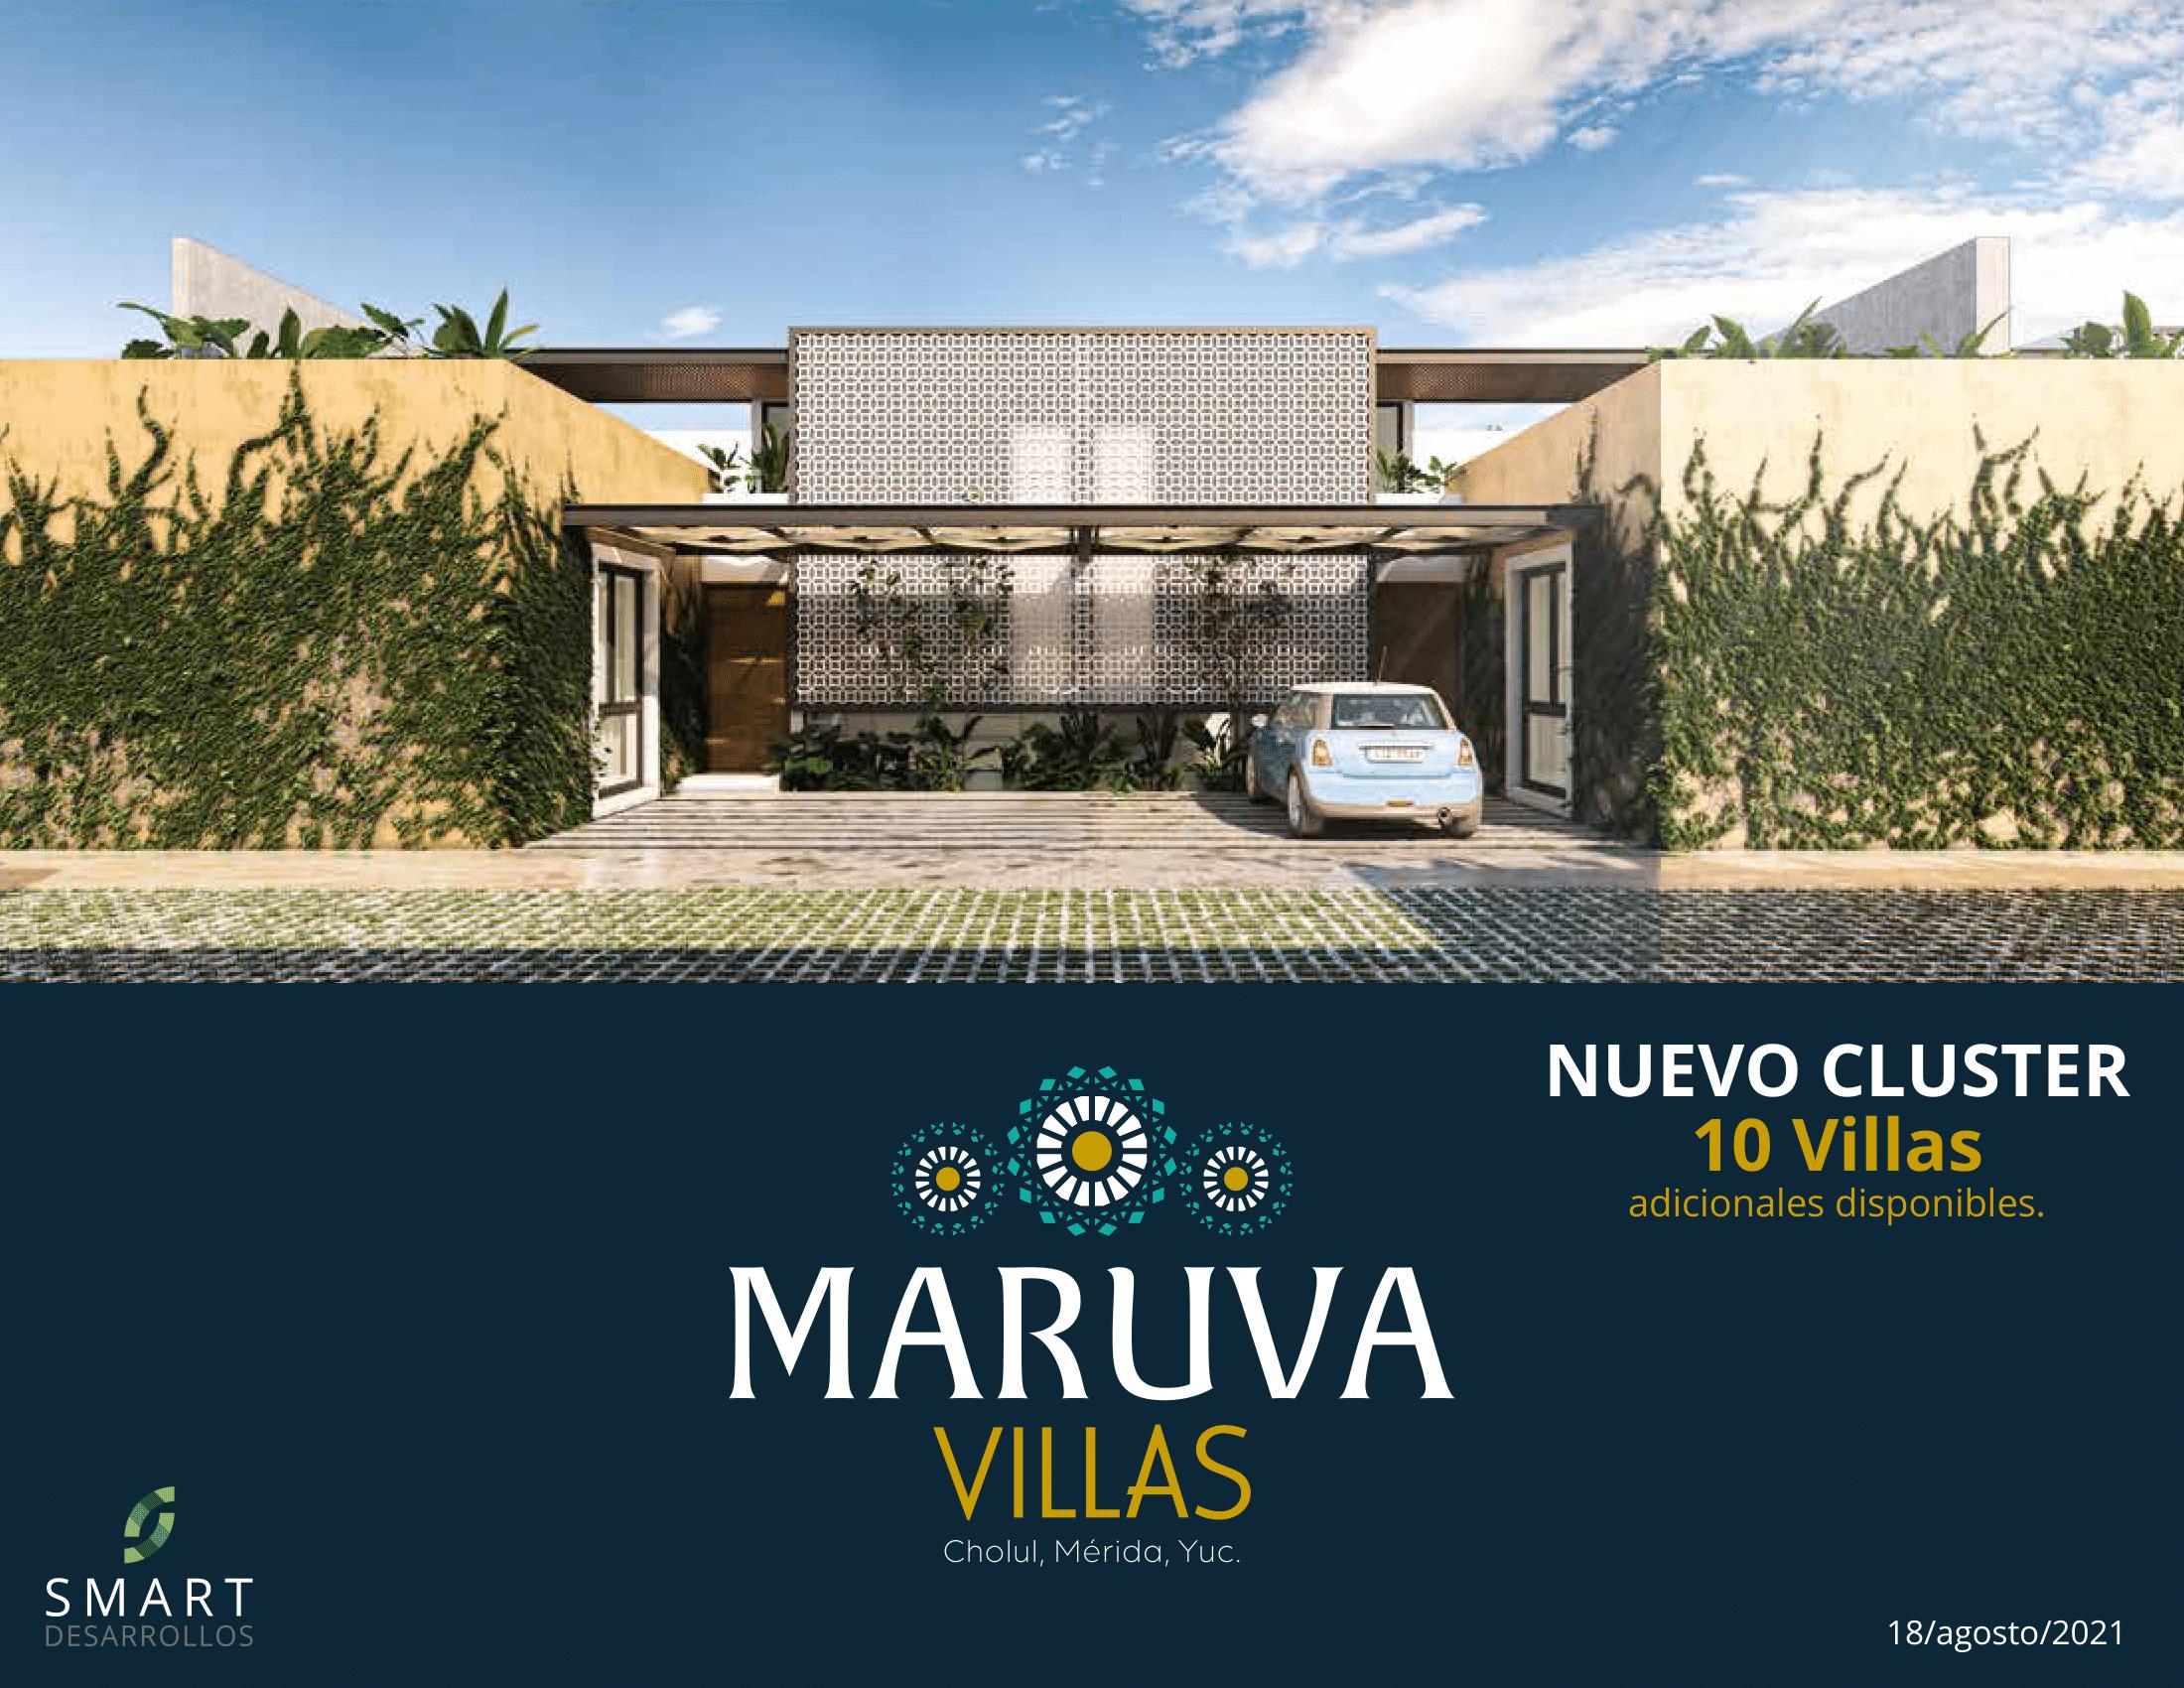 PRIVADA, MARUVA VILLAS (Cholul, Mérida, Yucatán)